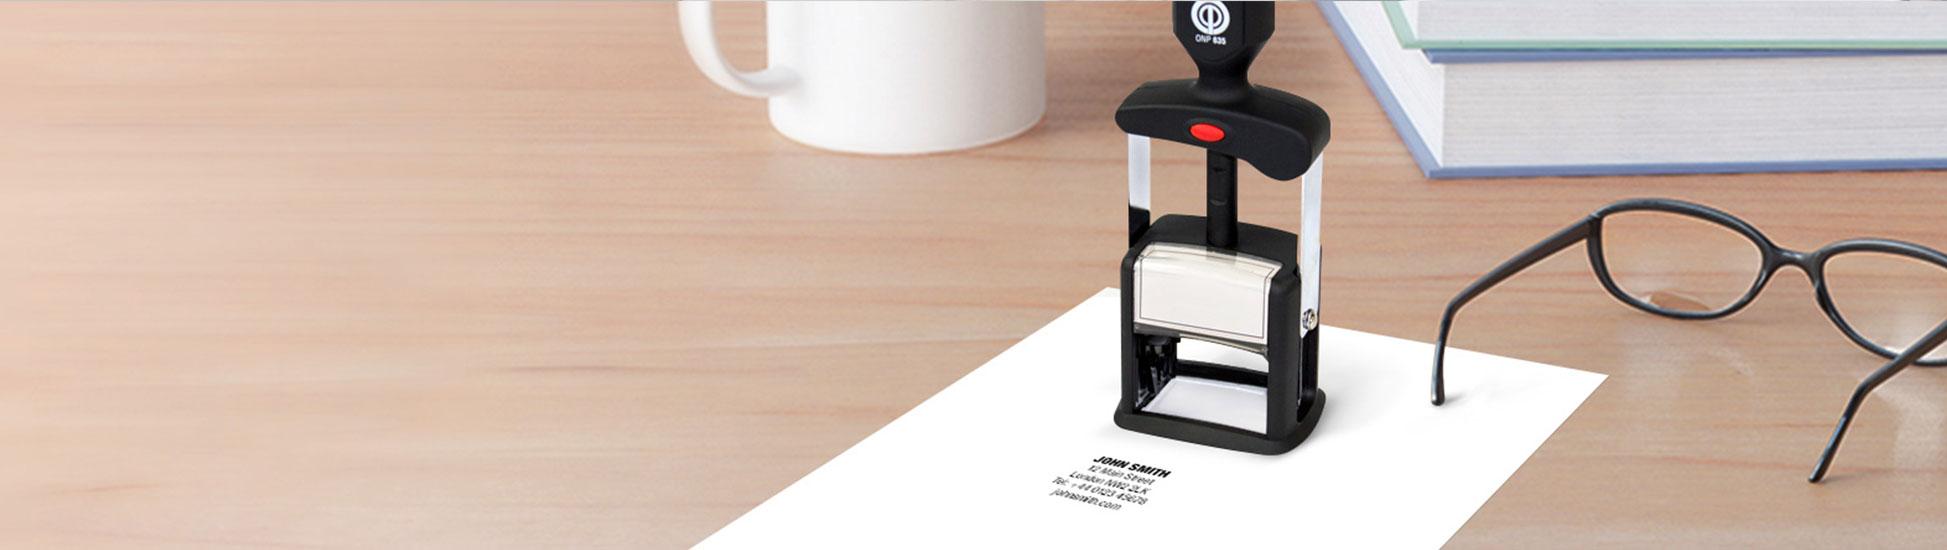 Custom metal stamper stamping white letter sized paper